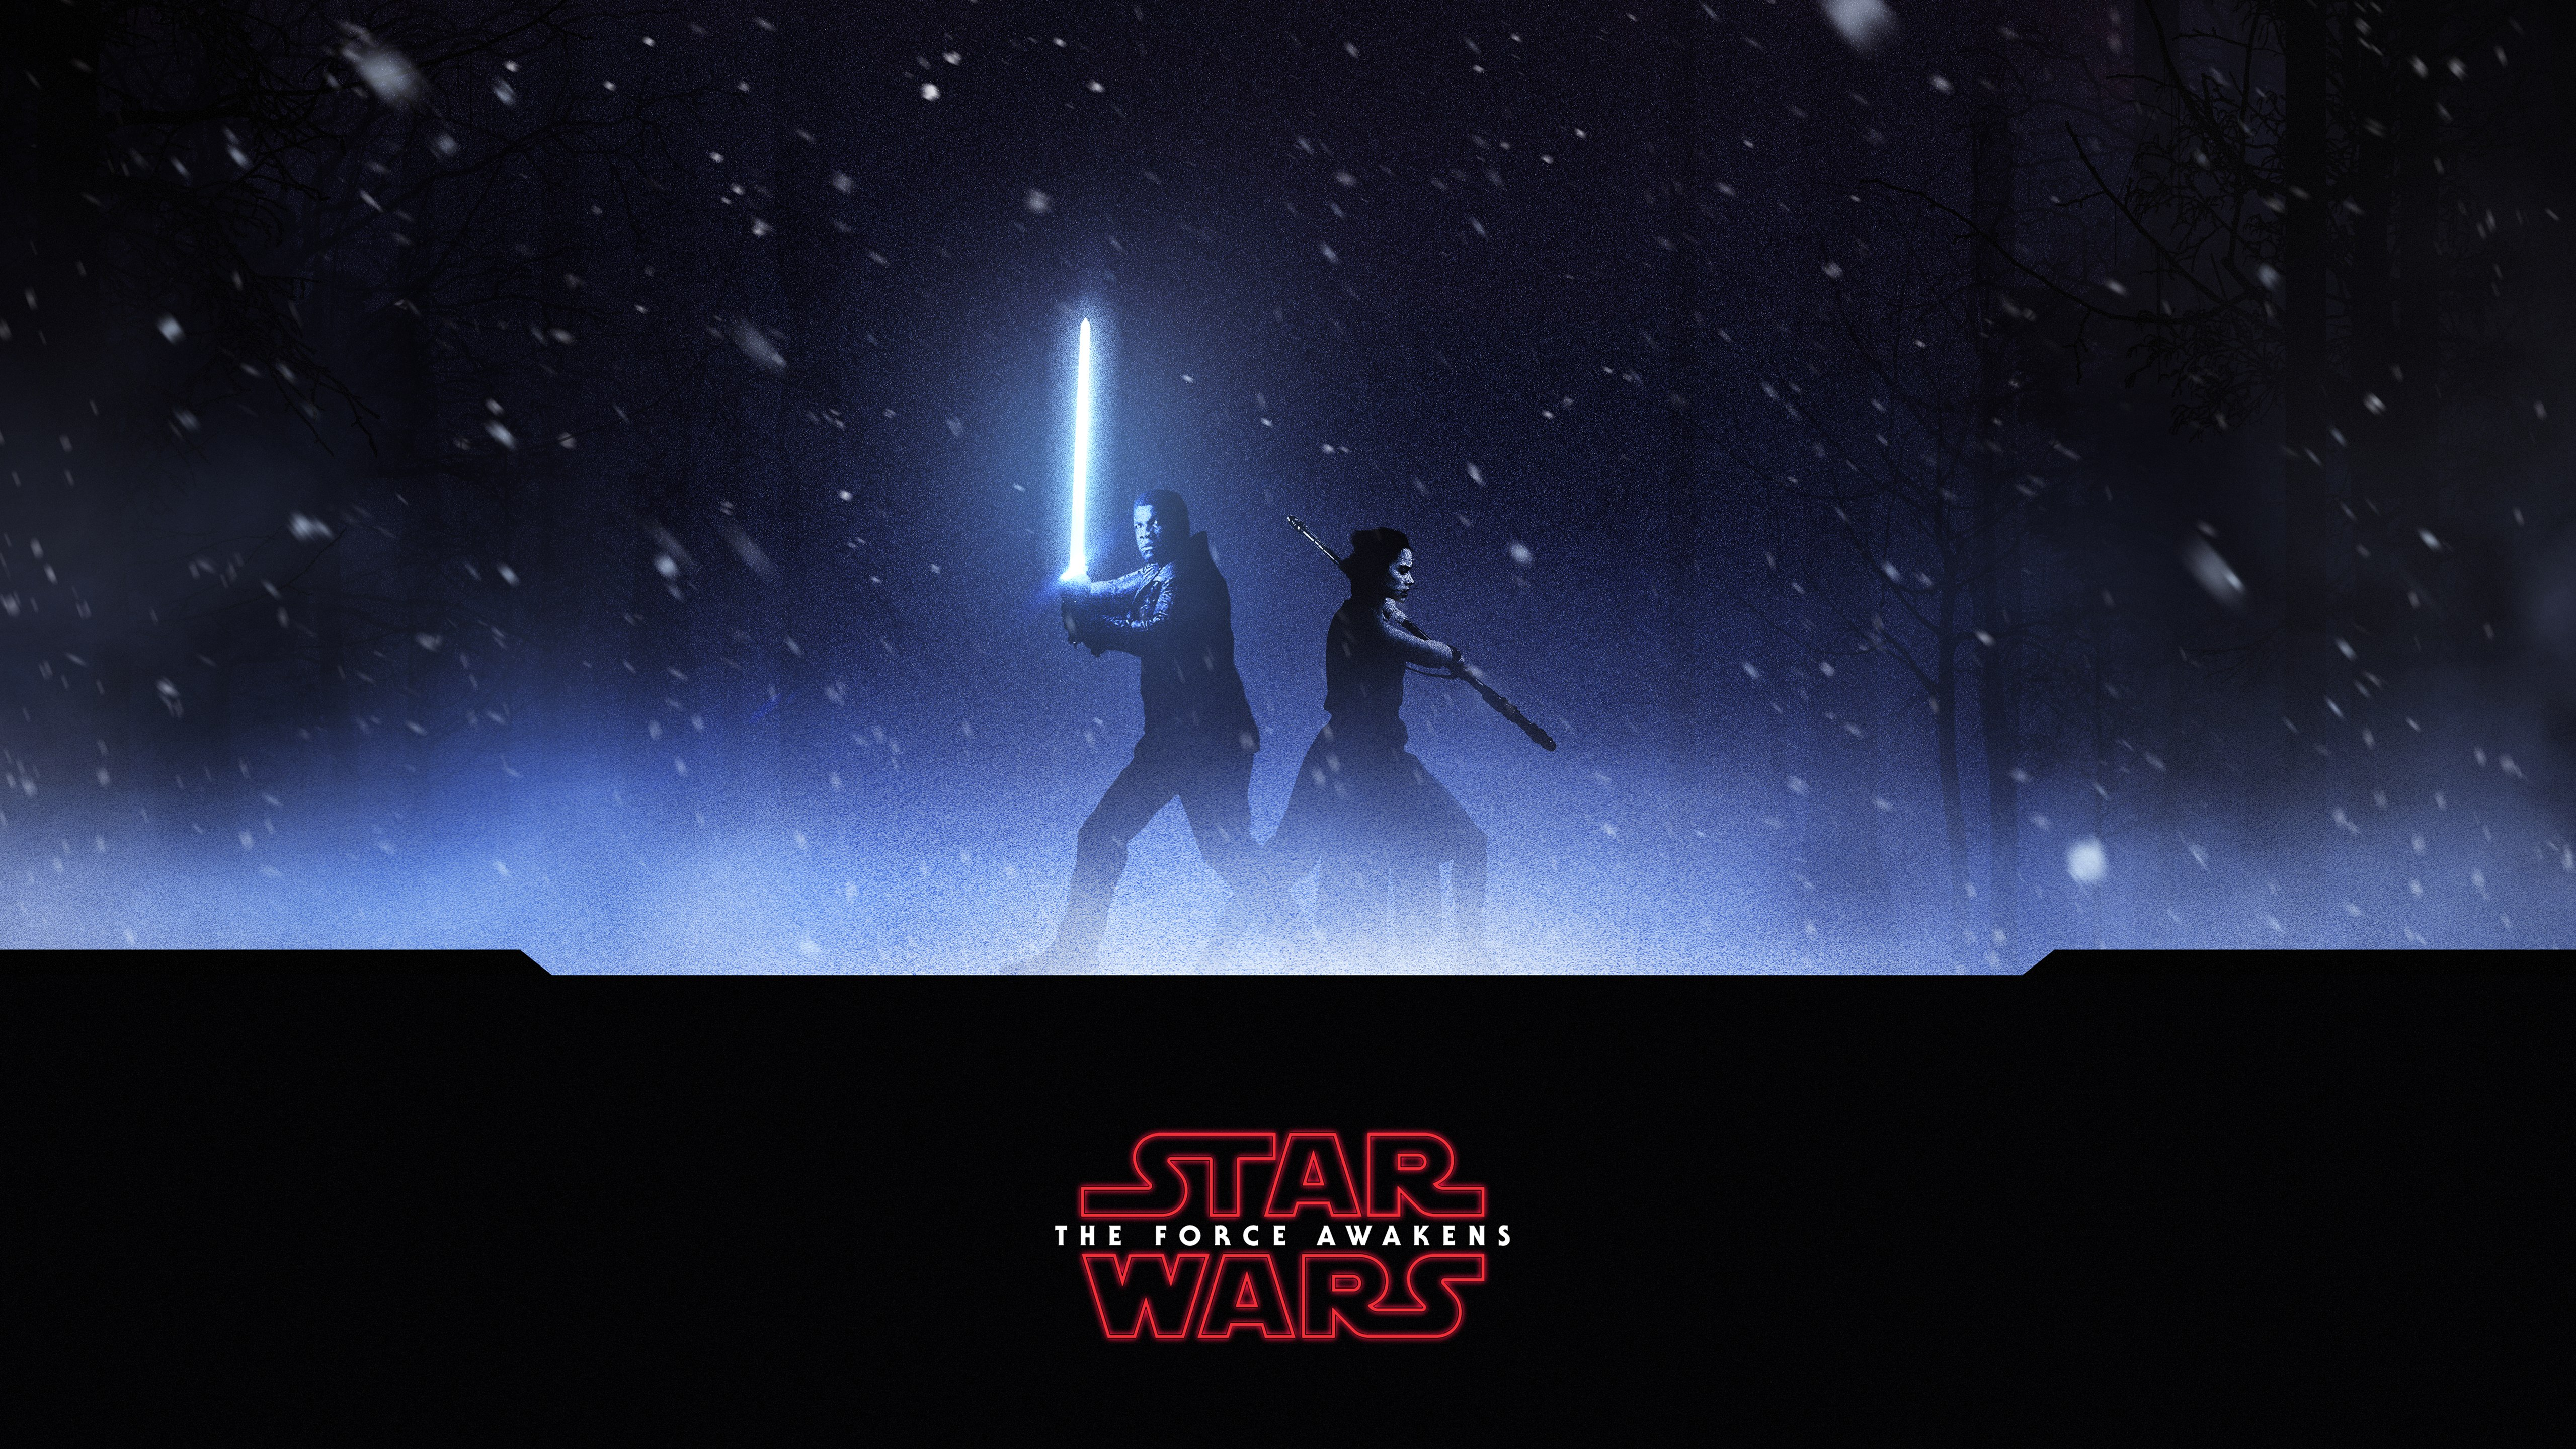 Free Download Star Wars Episode Vii The Force Awakens 5k Retina Ultra 5120x2880 For Your Desktop Mobile Tablet Explore 80 Star Wars Rey Wallpapers Star Wars Rey Wallpaper Star